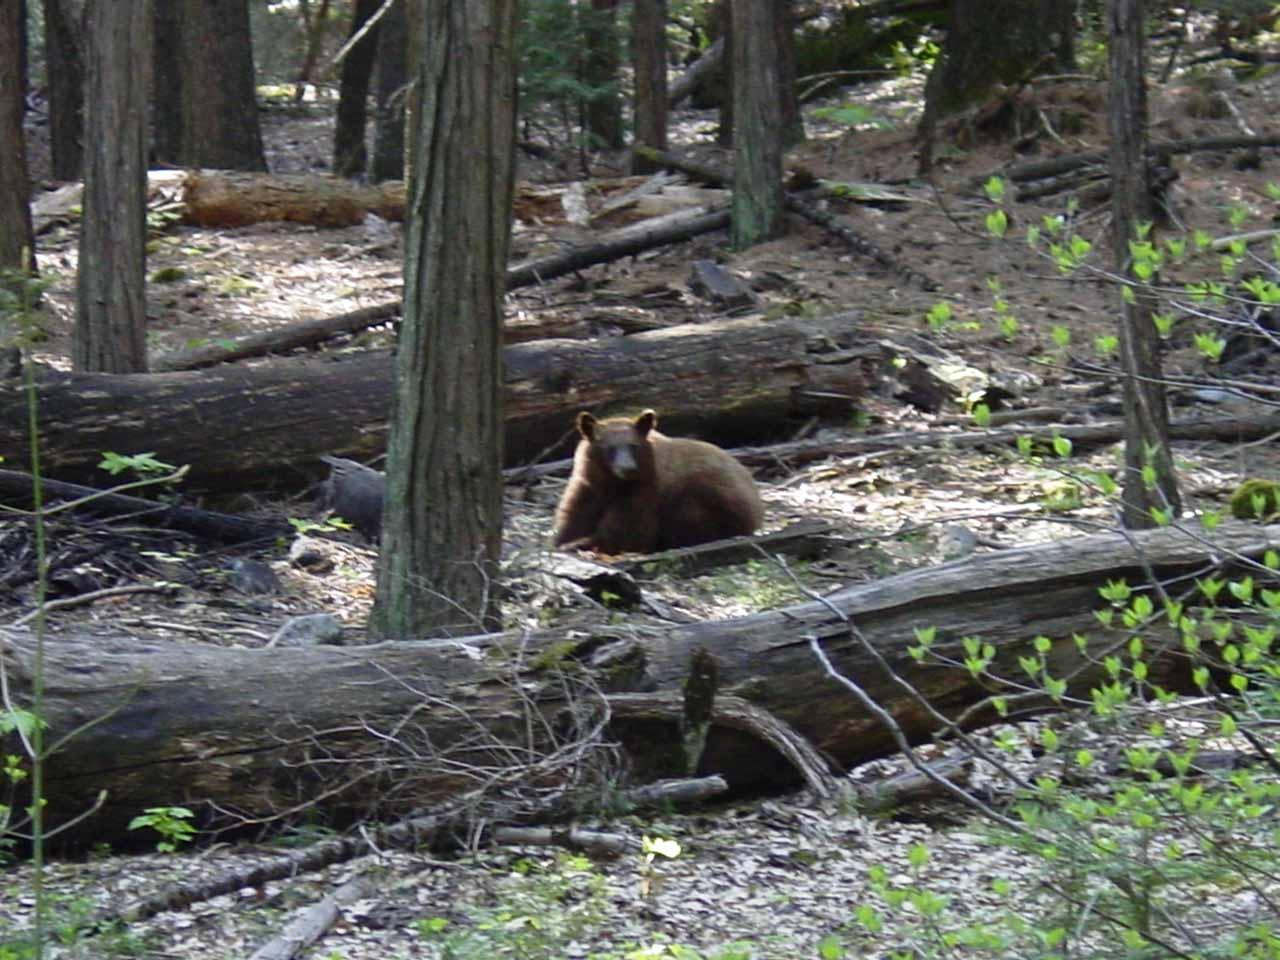 A bear in Yosemite near Fern Spring in April 2004